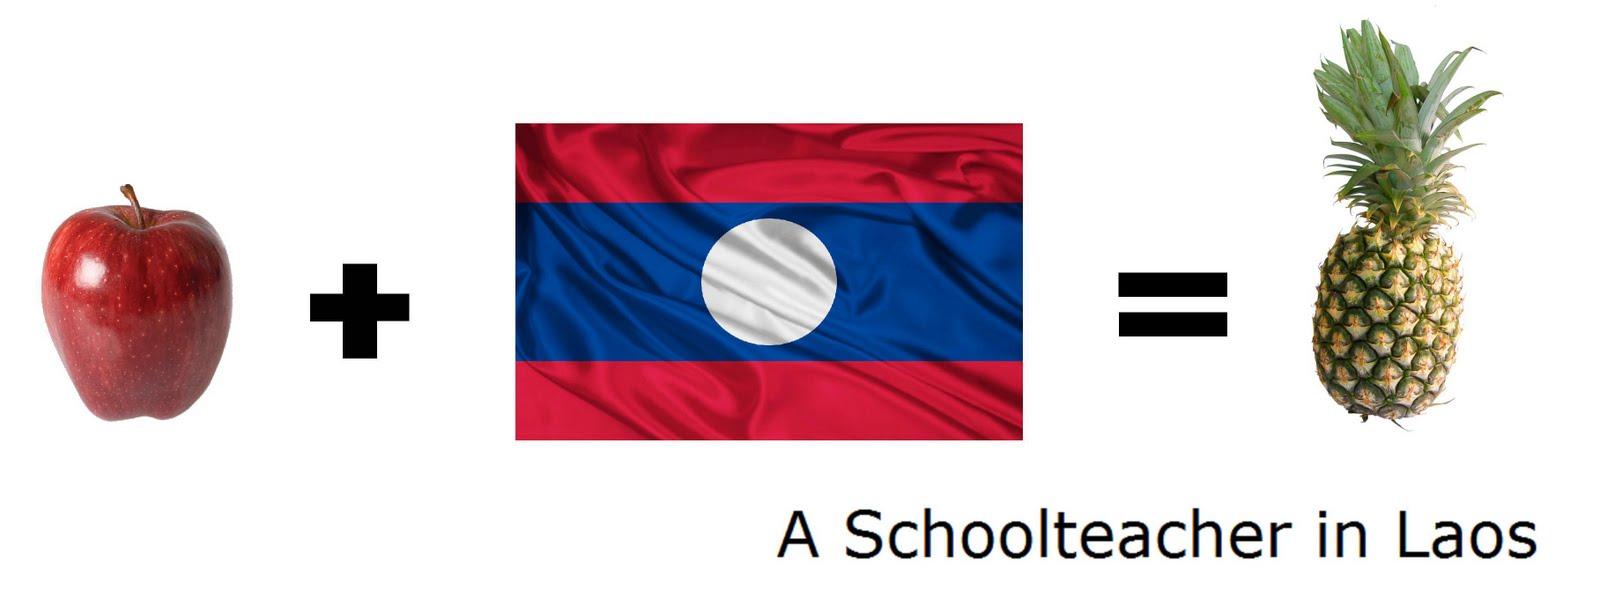 A Schoolteacher in Laos